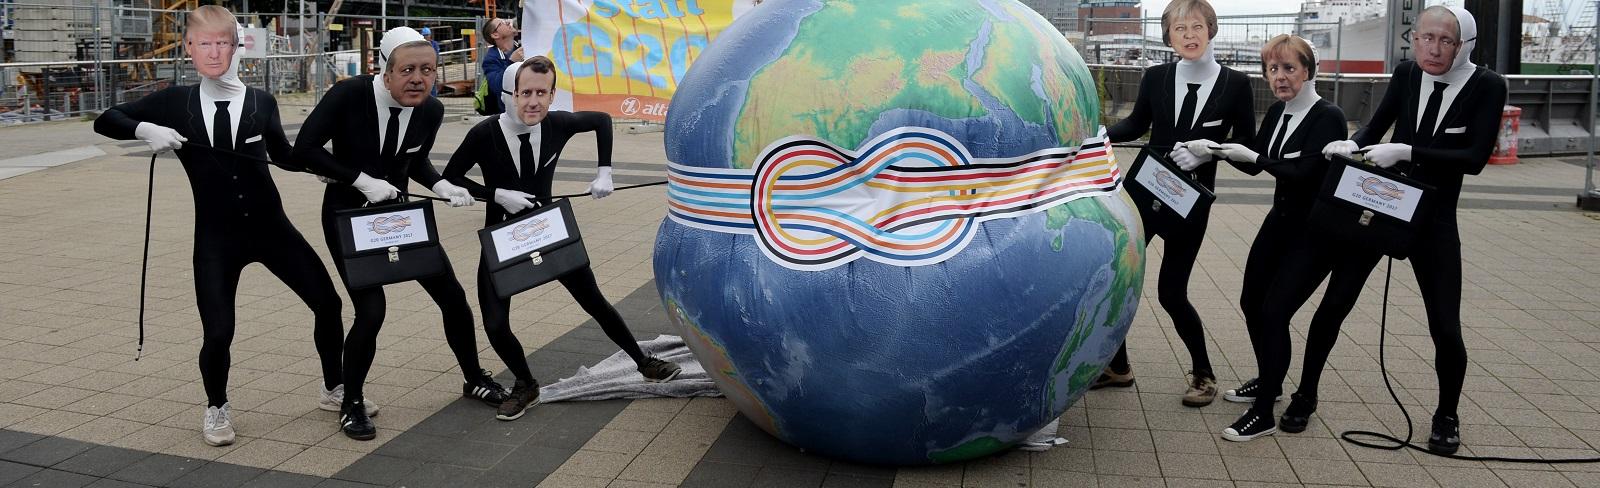 Protestors in Hamburg ahead of the G20 Summit (Photo: Morris MacMatzen/Getty Images)